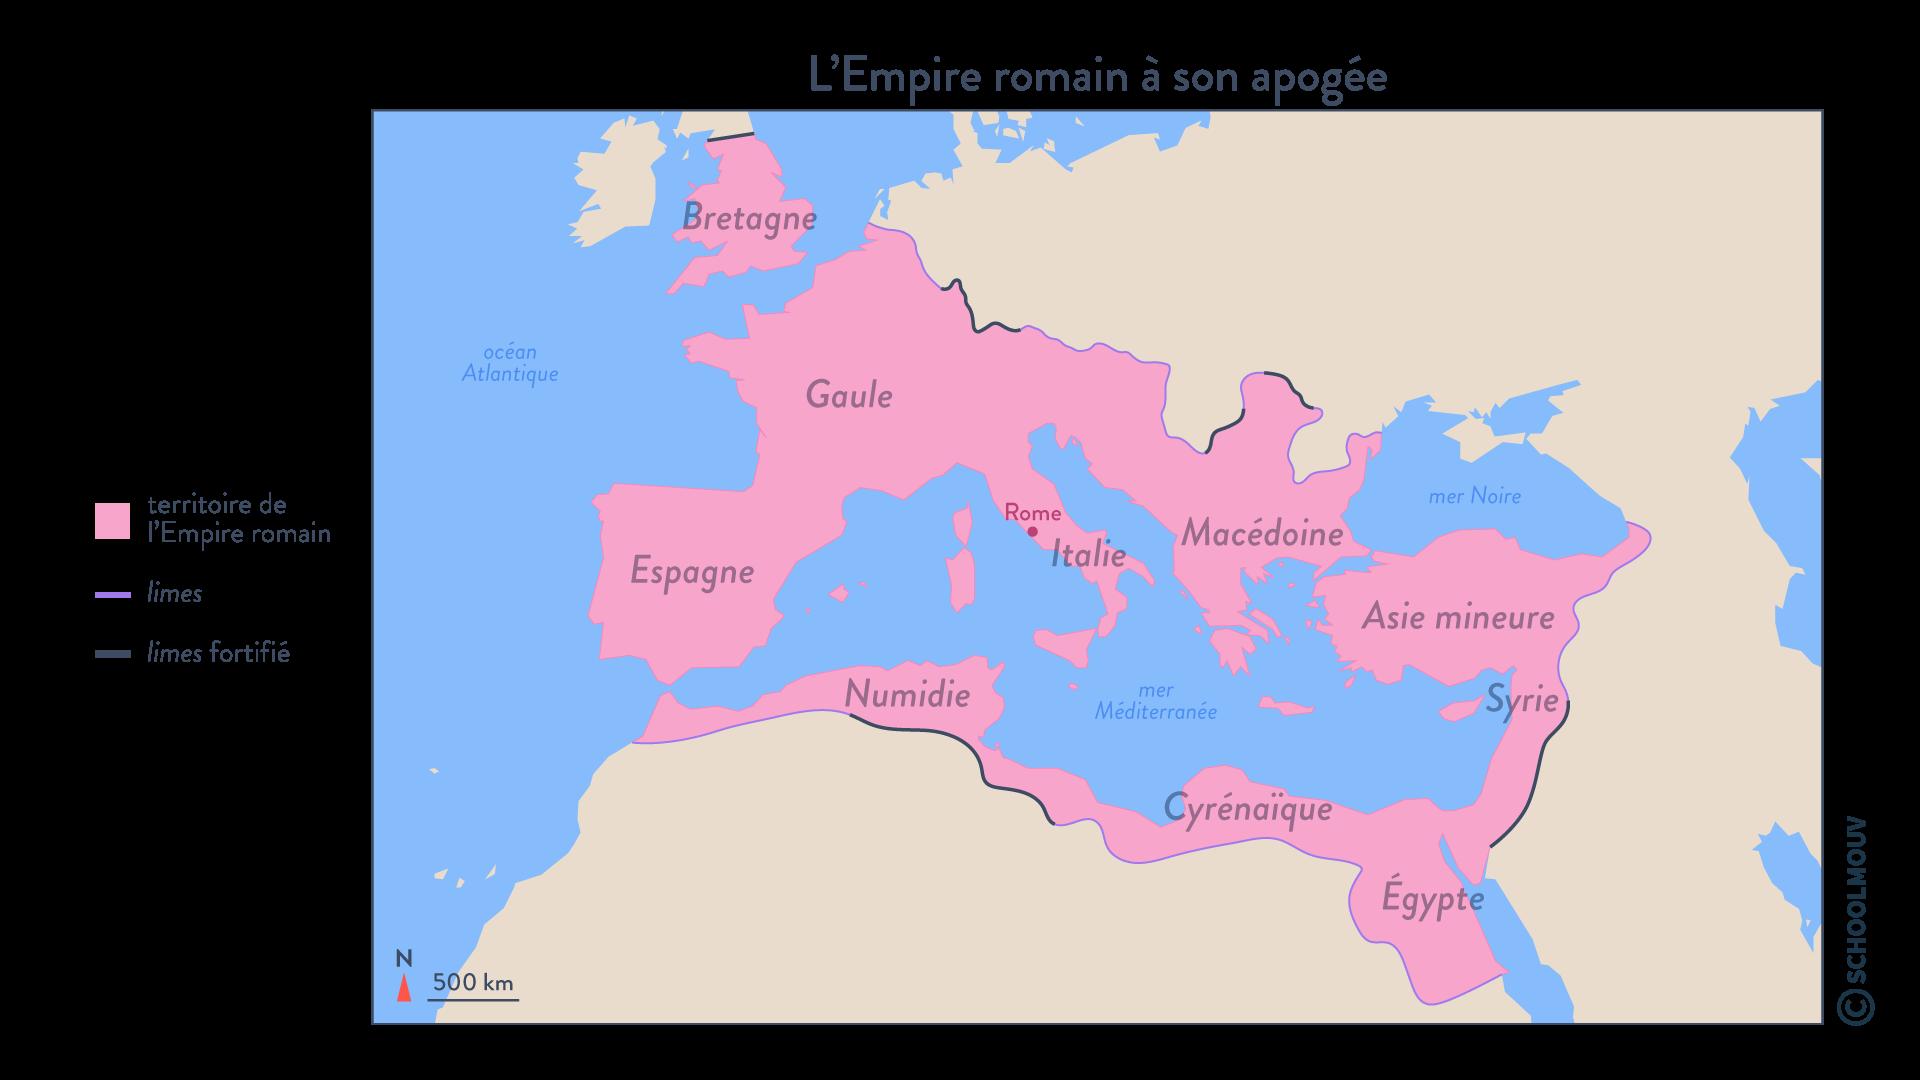 2017 opérations maintien paix